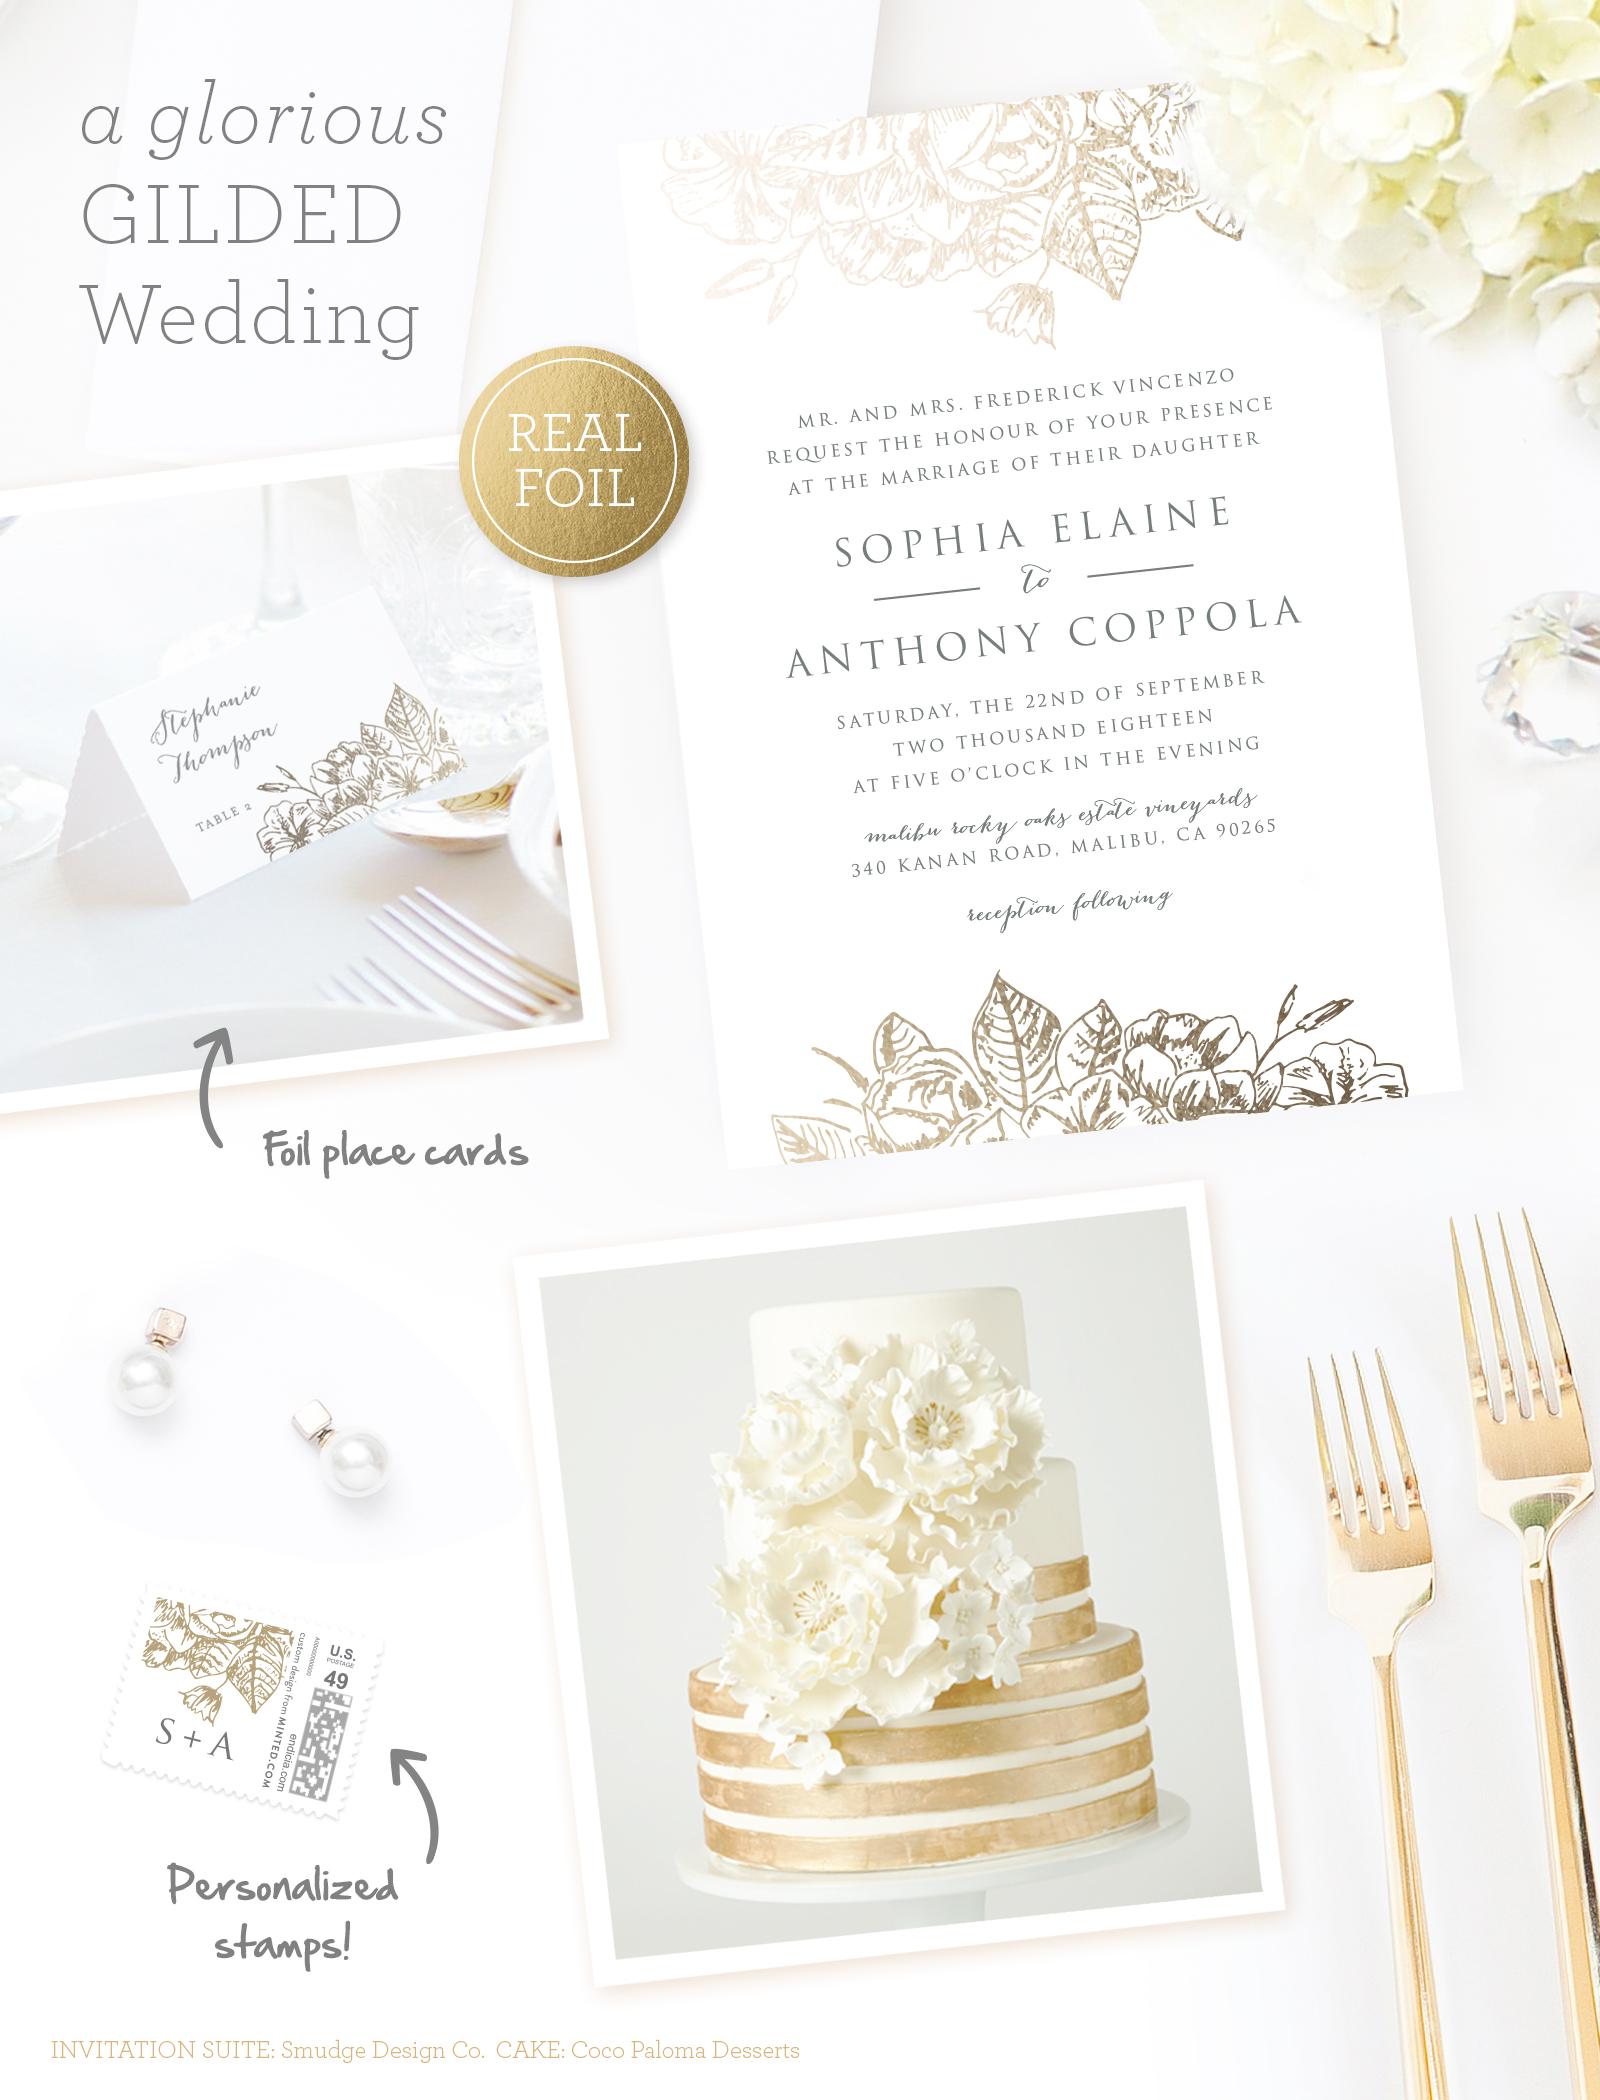 gilded-wildflowers-wedding-smudge-design.jpg